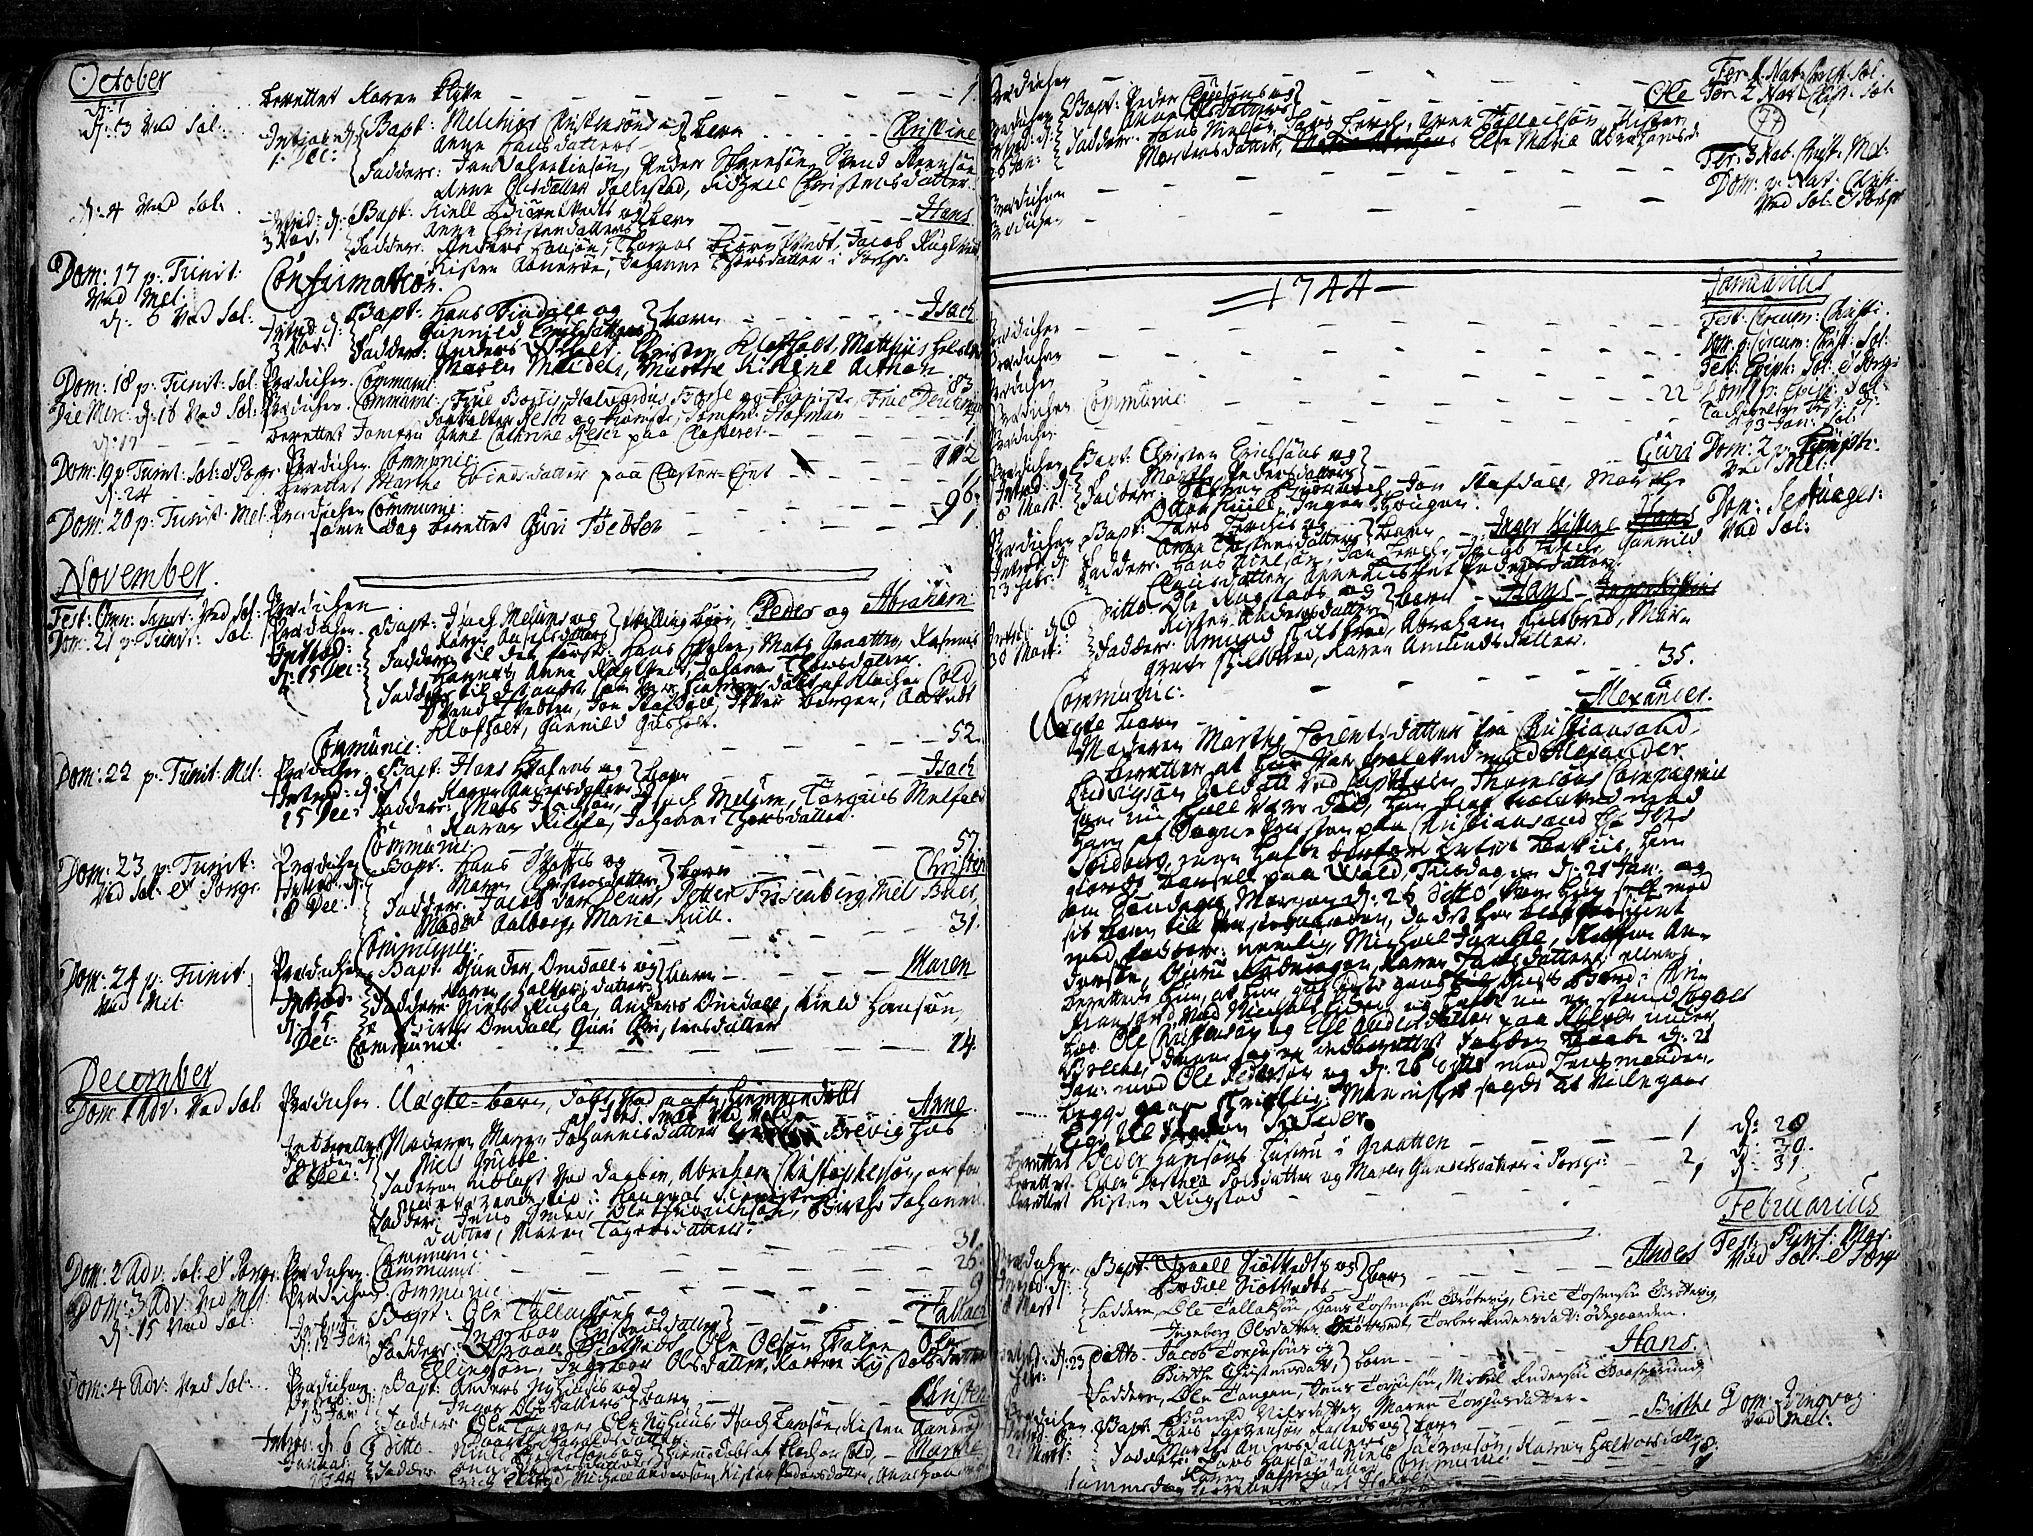 SAKO, Solum kirkebøker, F/Fa/L0002: Ministerialbok nr. I 2, 1713-1761, s. 77